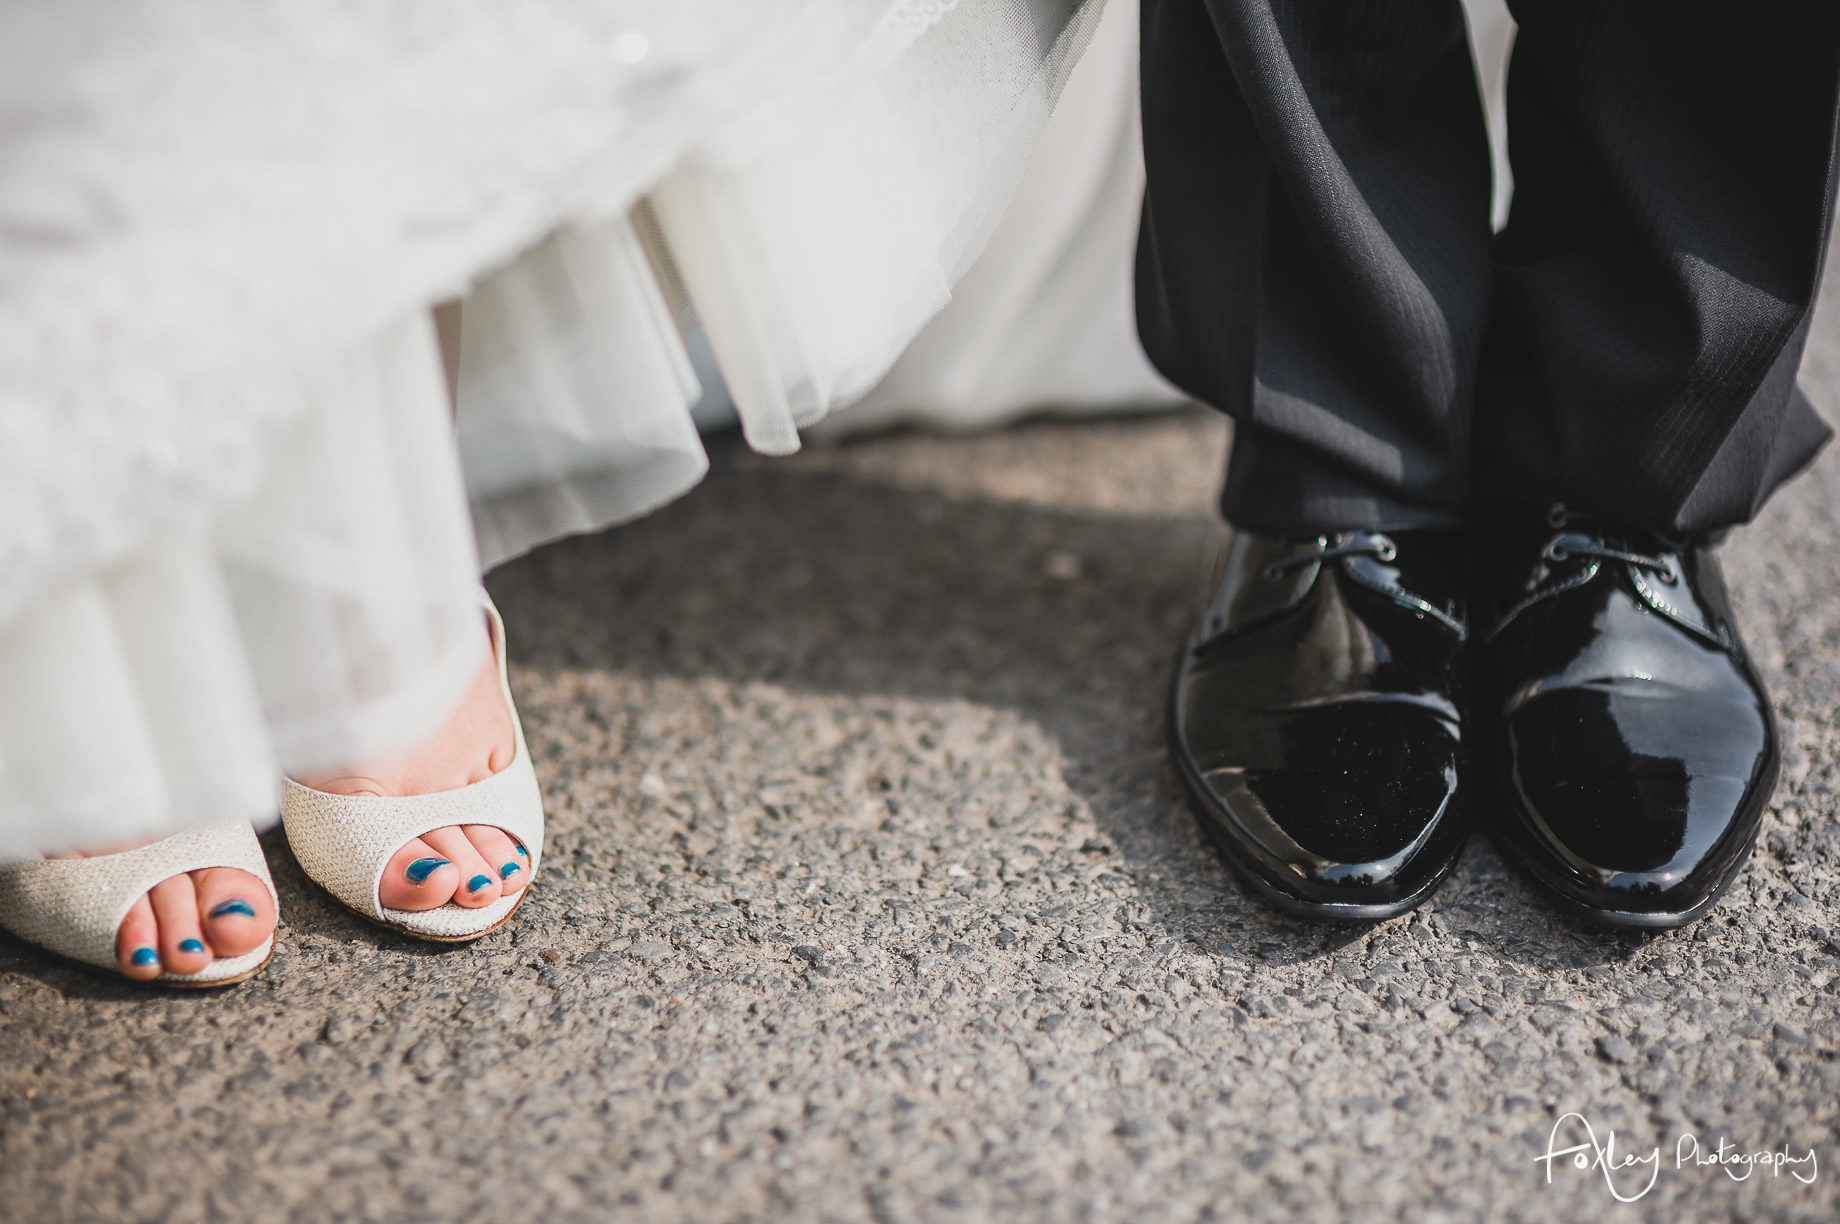 Gemma and Lewis' Wedding at Mitton Hall 091